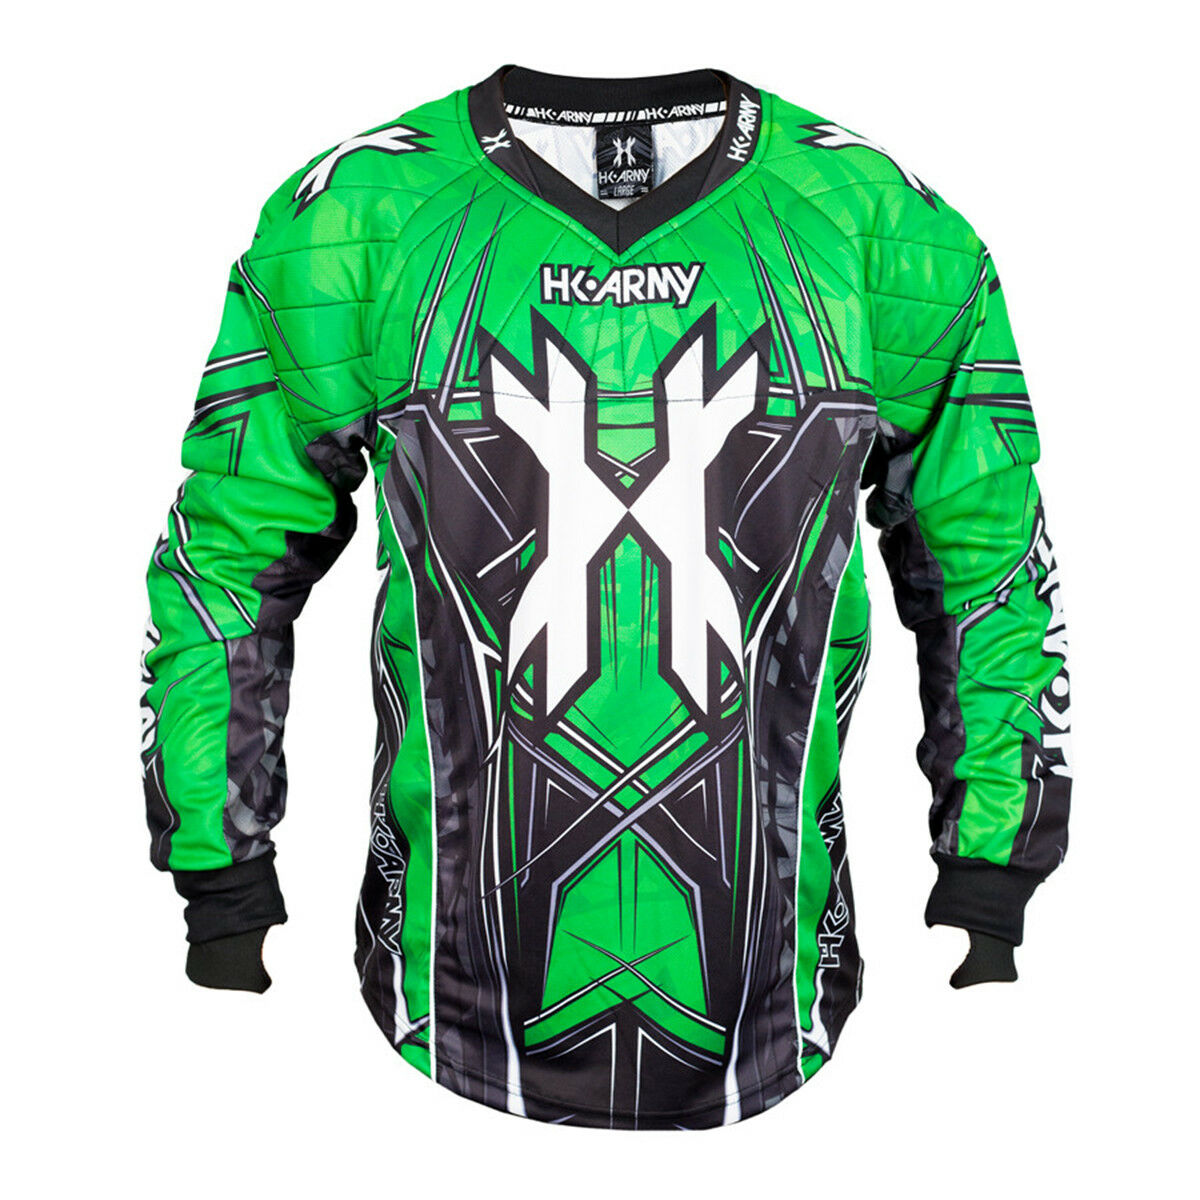 HK Army HSTL Line Paintball Jersey - Neon Green - XL